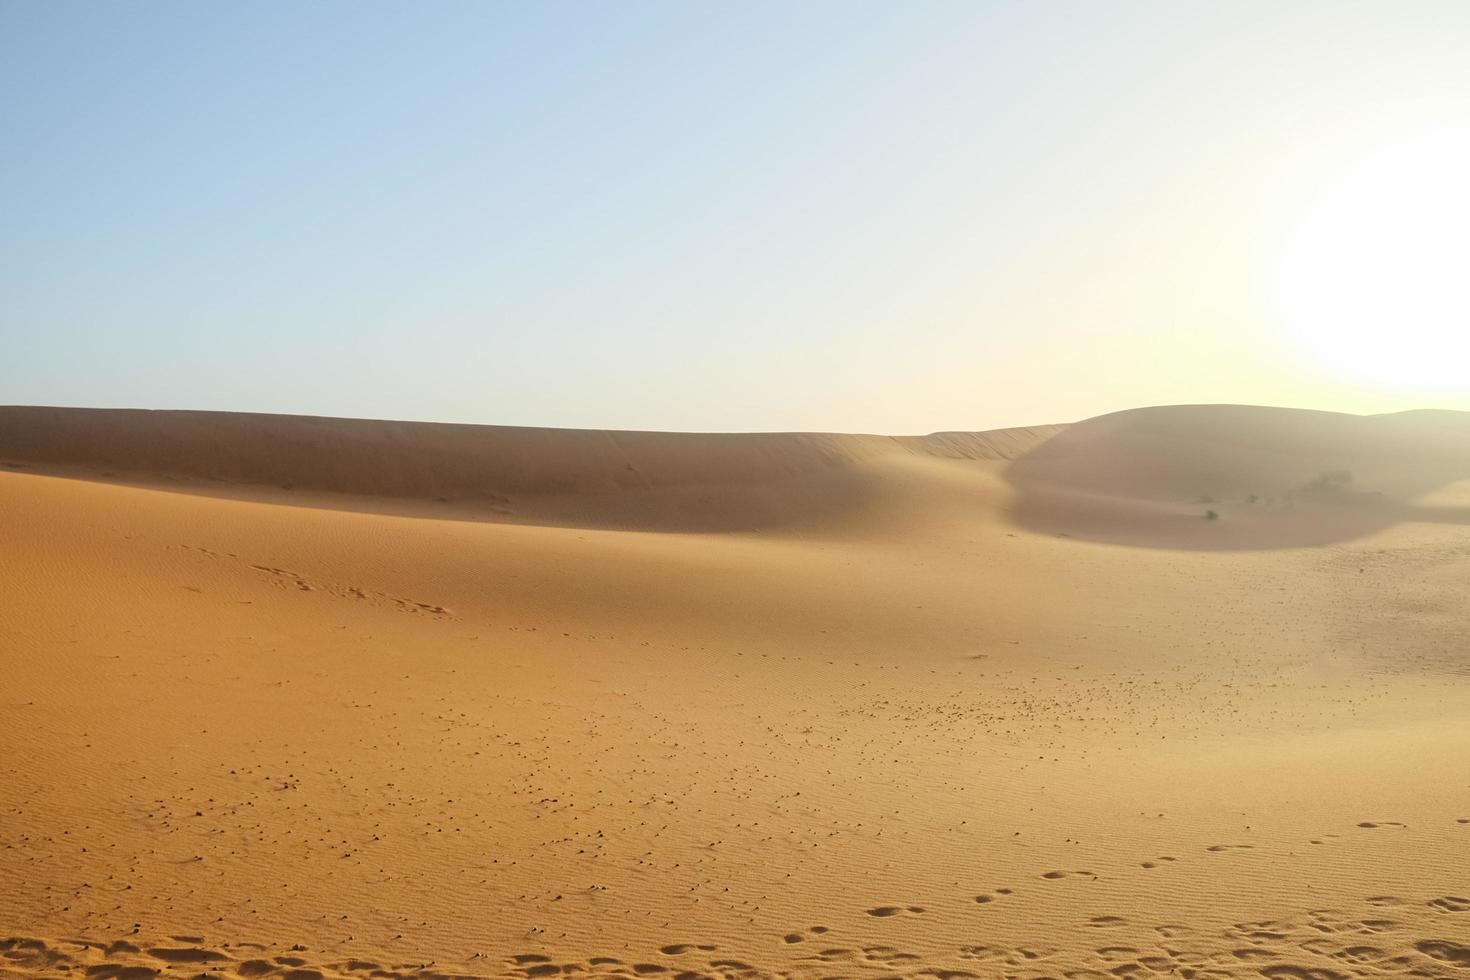 Dunes de sable de l'erg chebbi avec ciel bleu clair photo